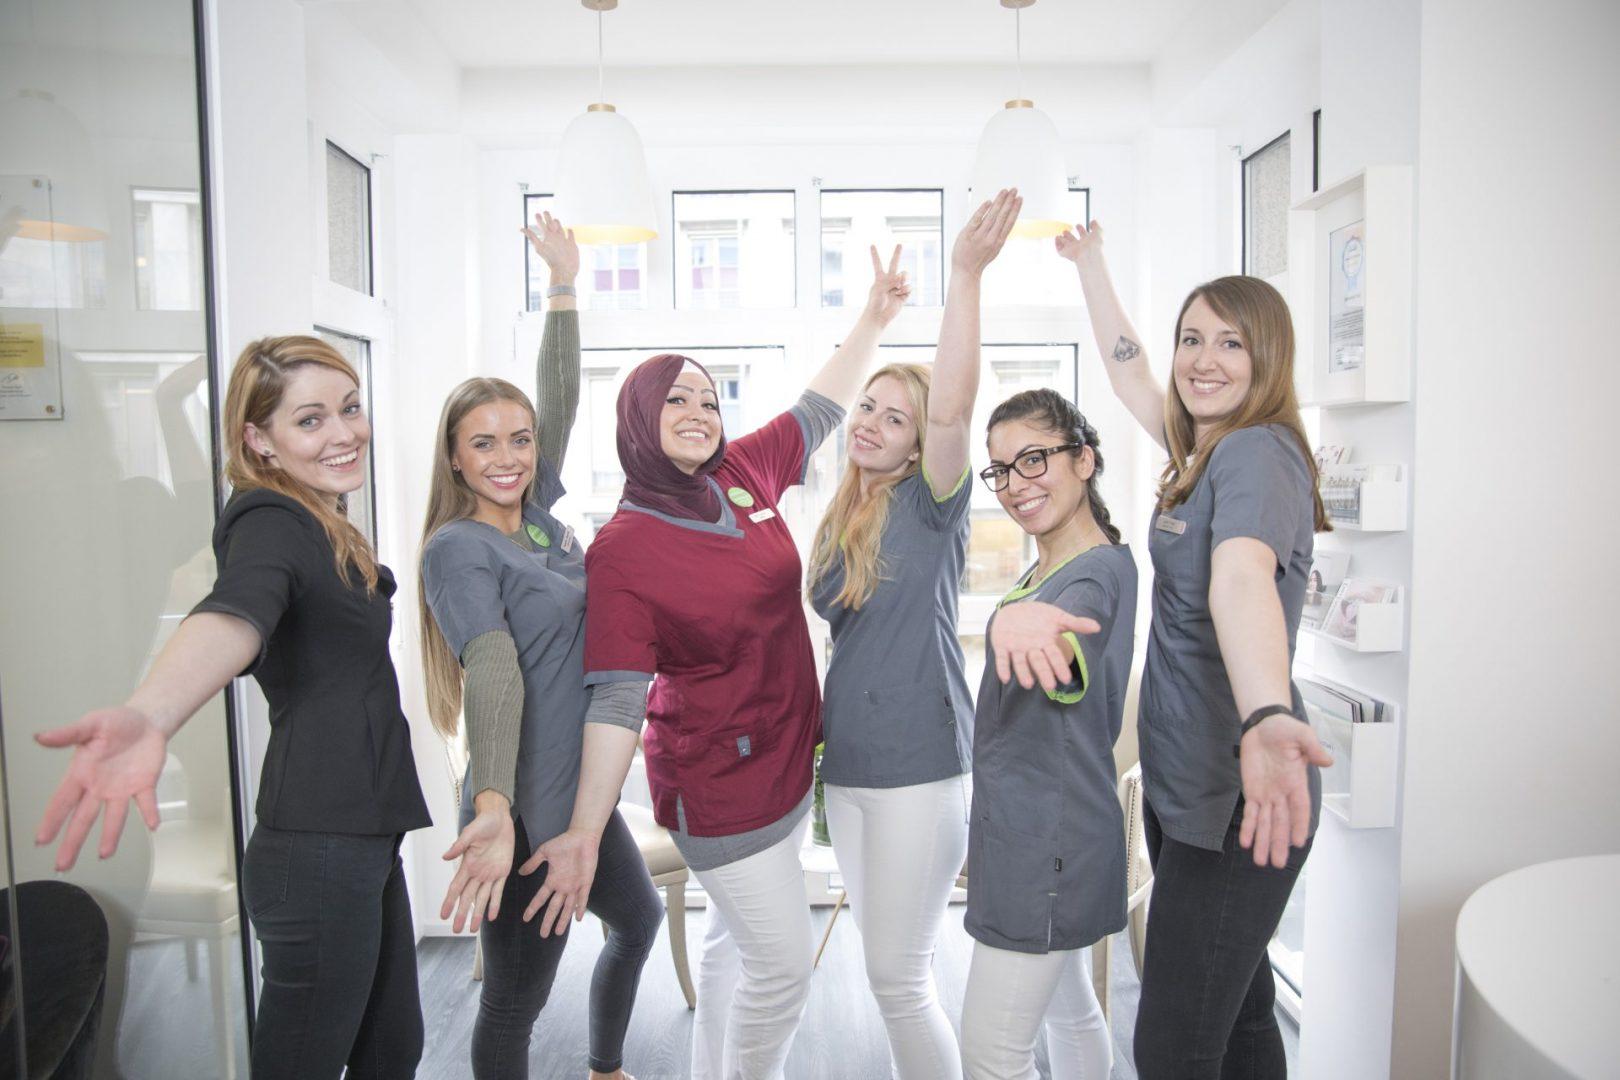 Zahnarzt Köln | ZAHNKULTUR) ist online